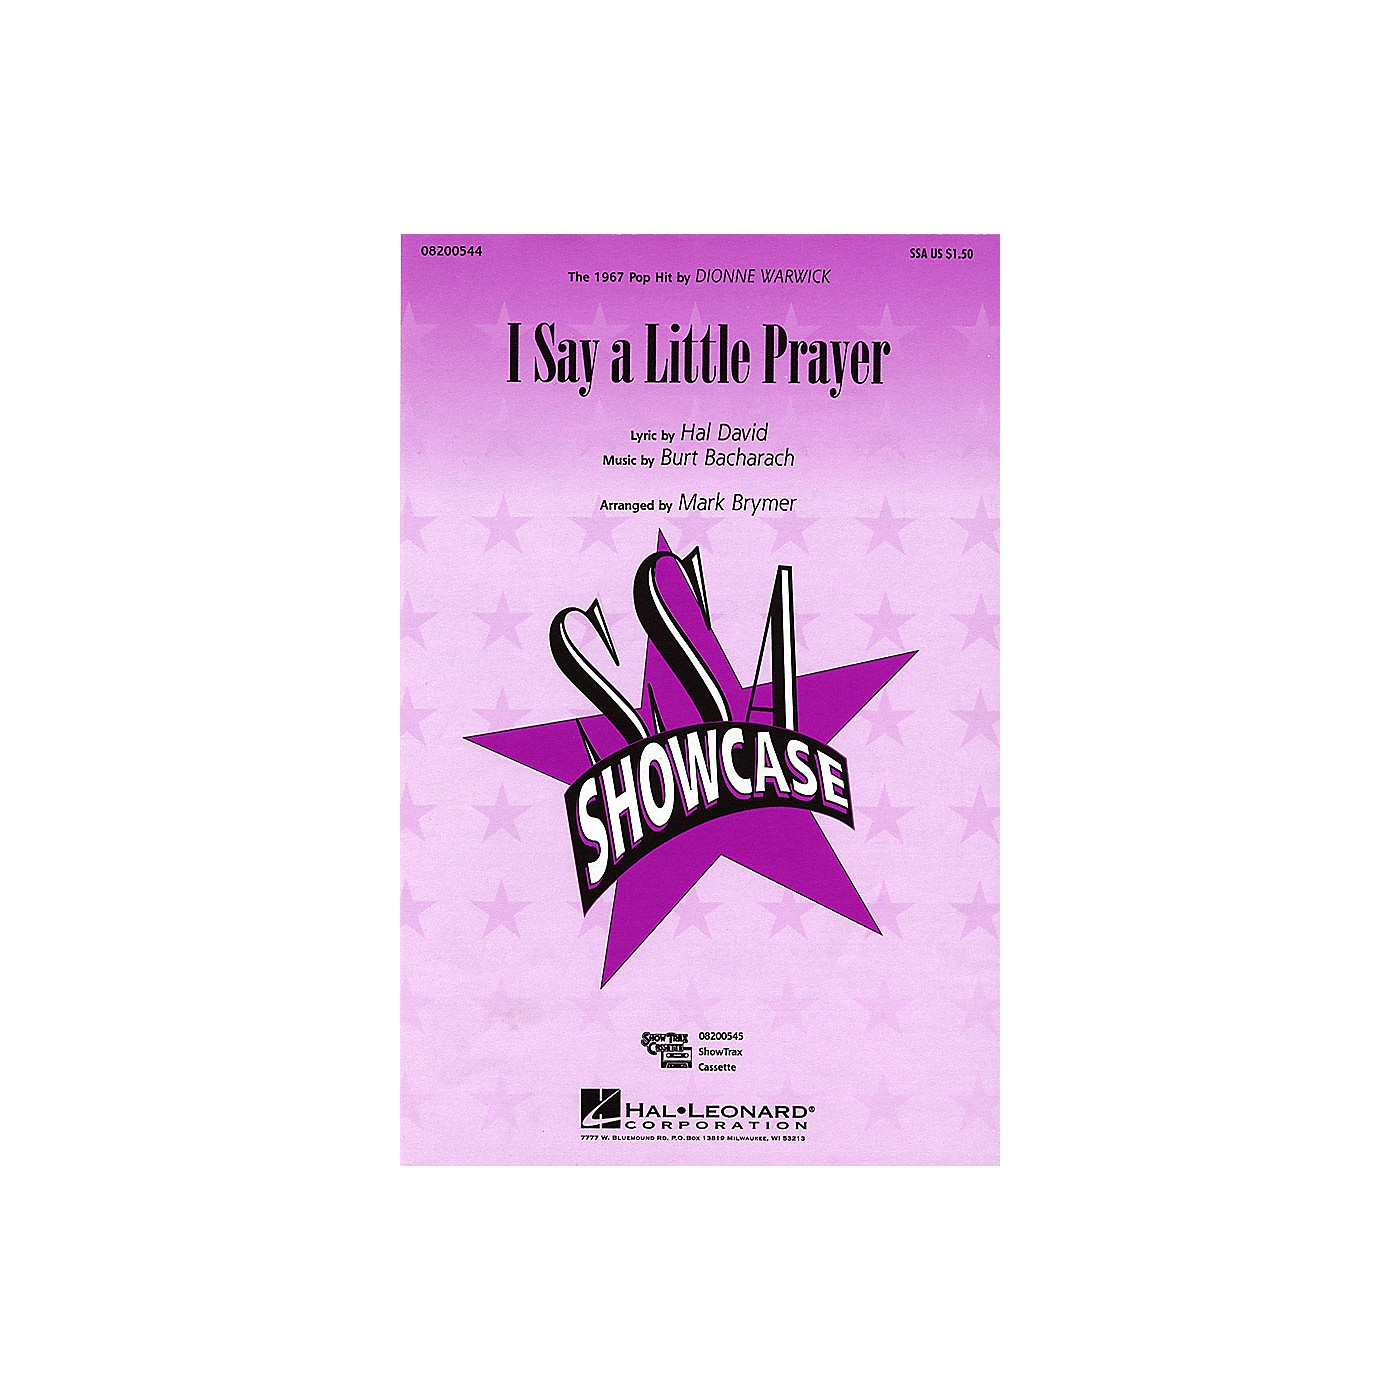 Hal Leonard I Say a Little Prayer SSA by Dionne Warwick arranged by Mark Brymer thumbnail